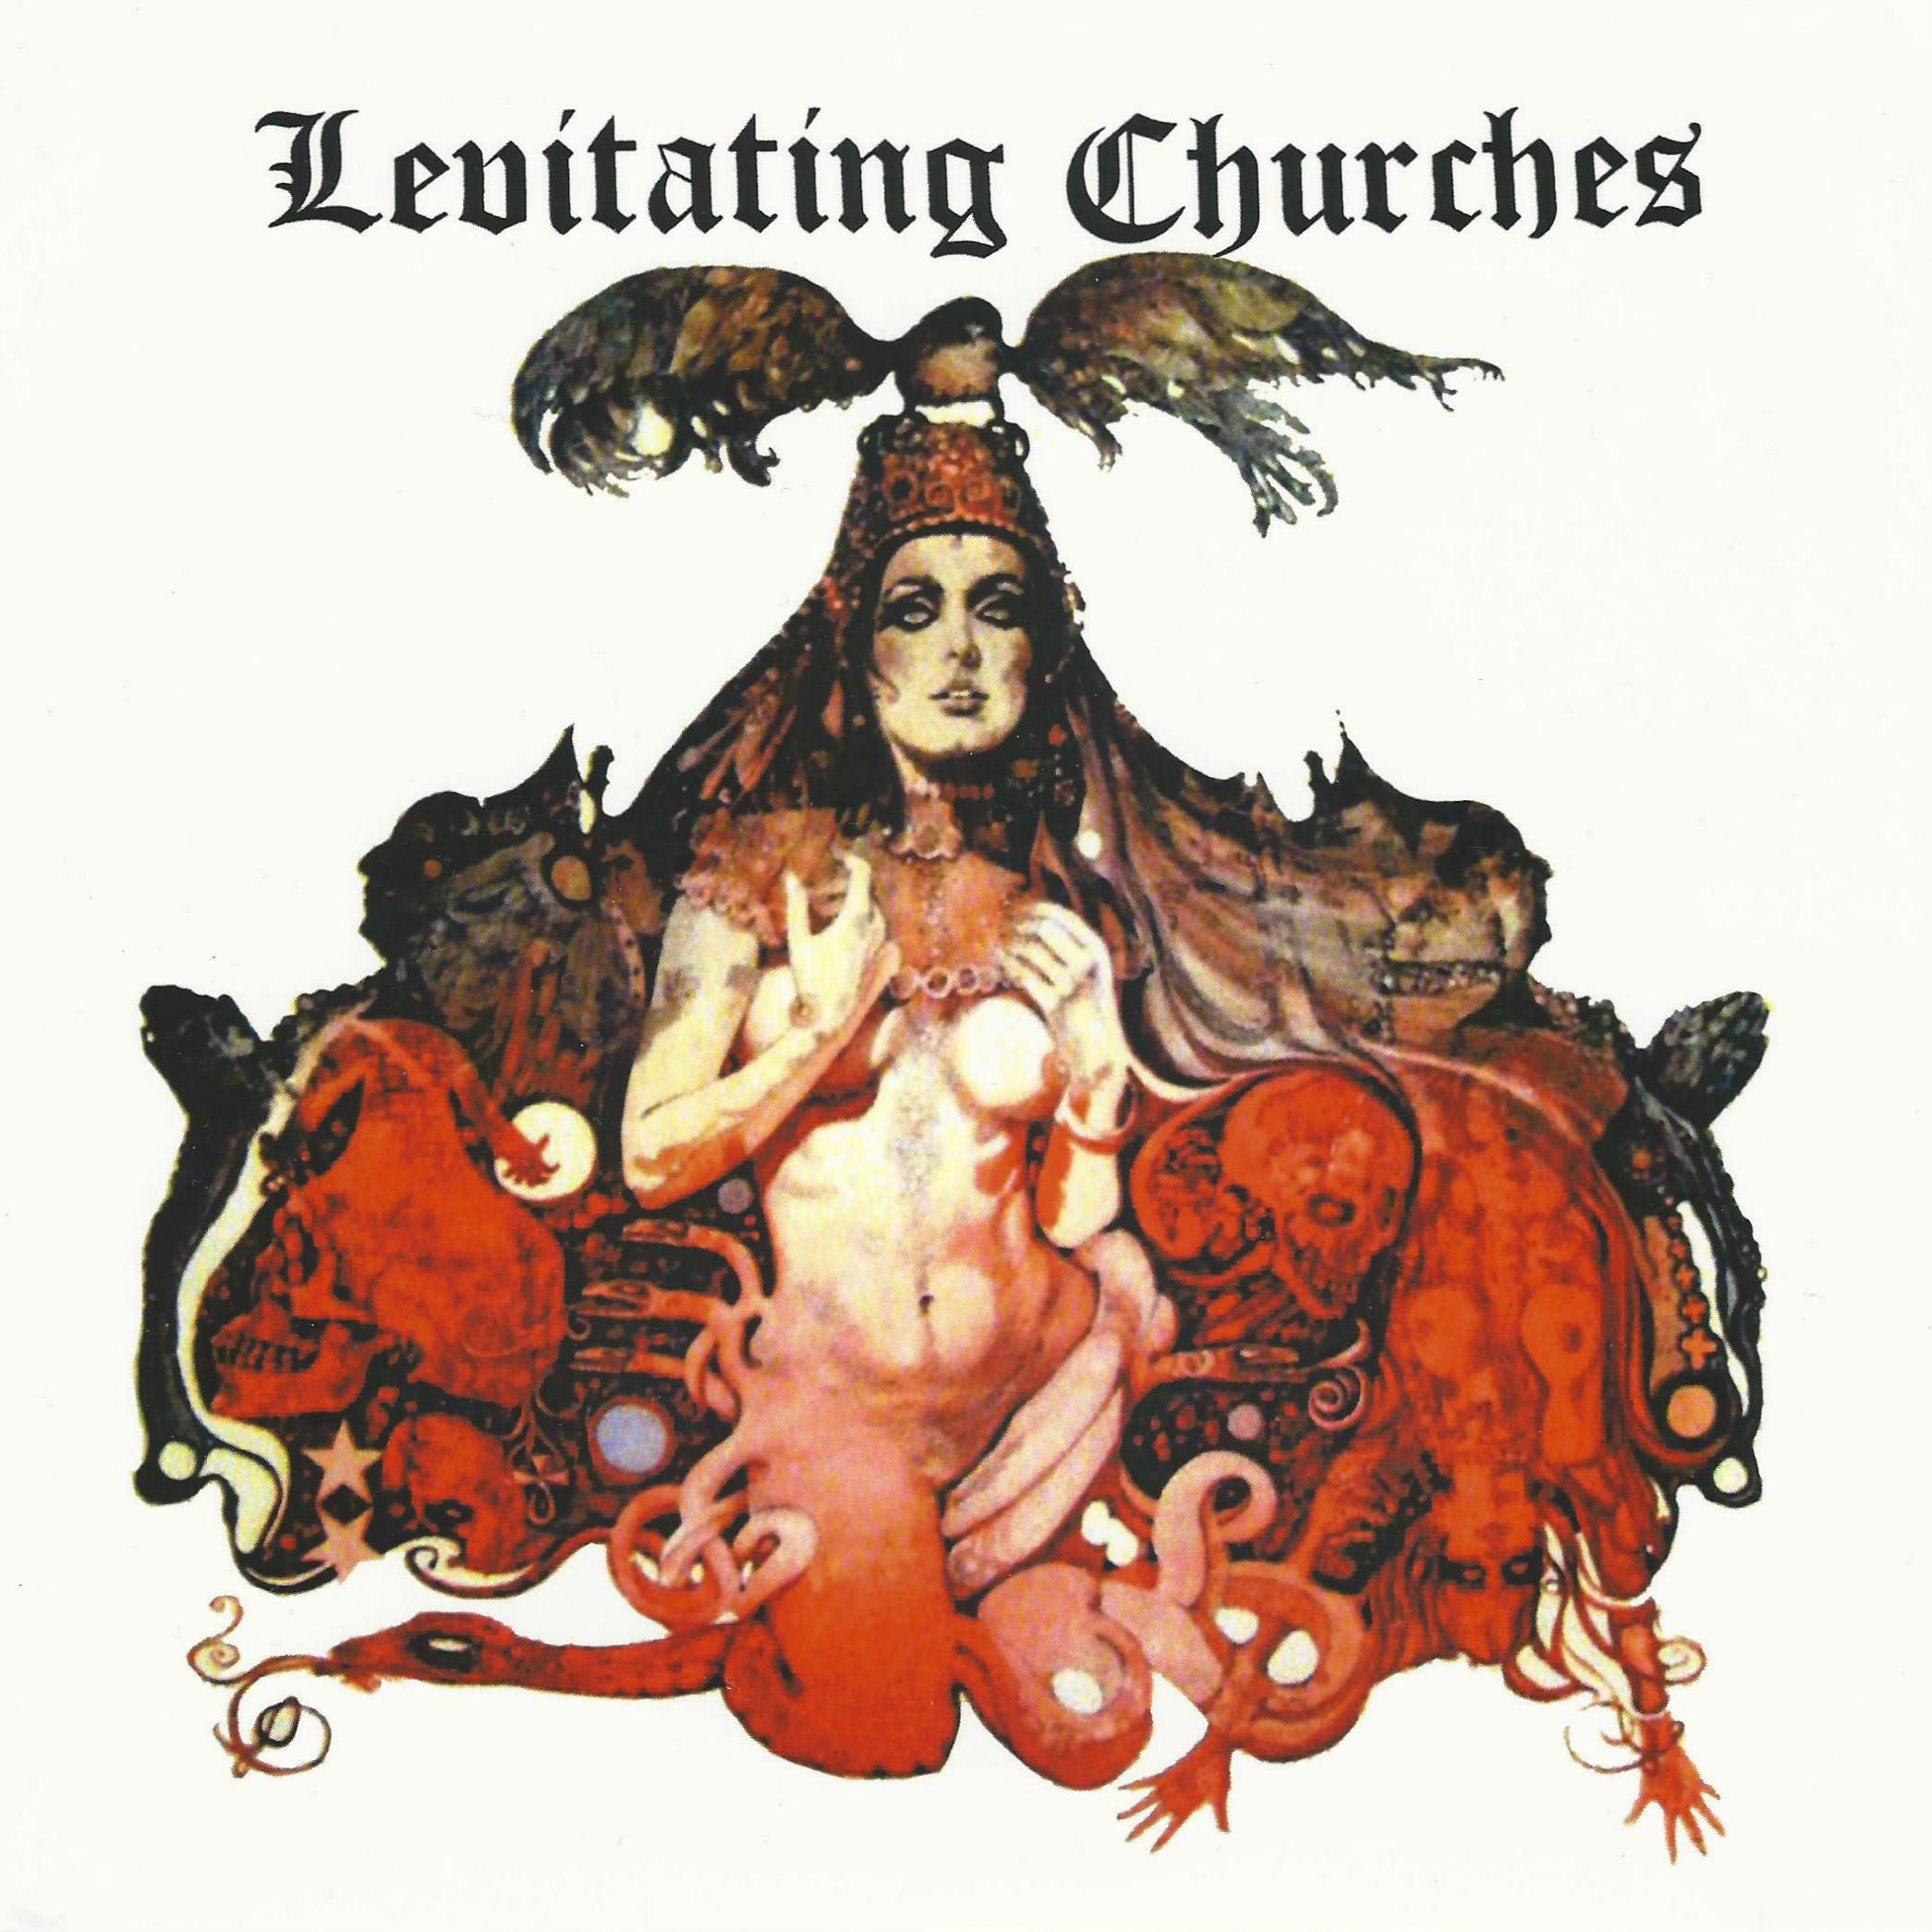 Levatating Churches 7.jpg